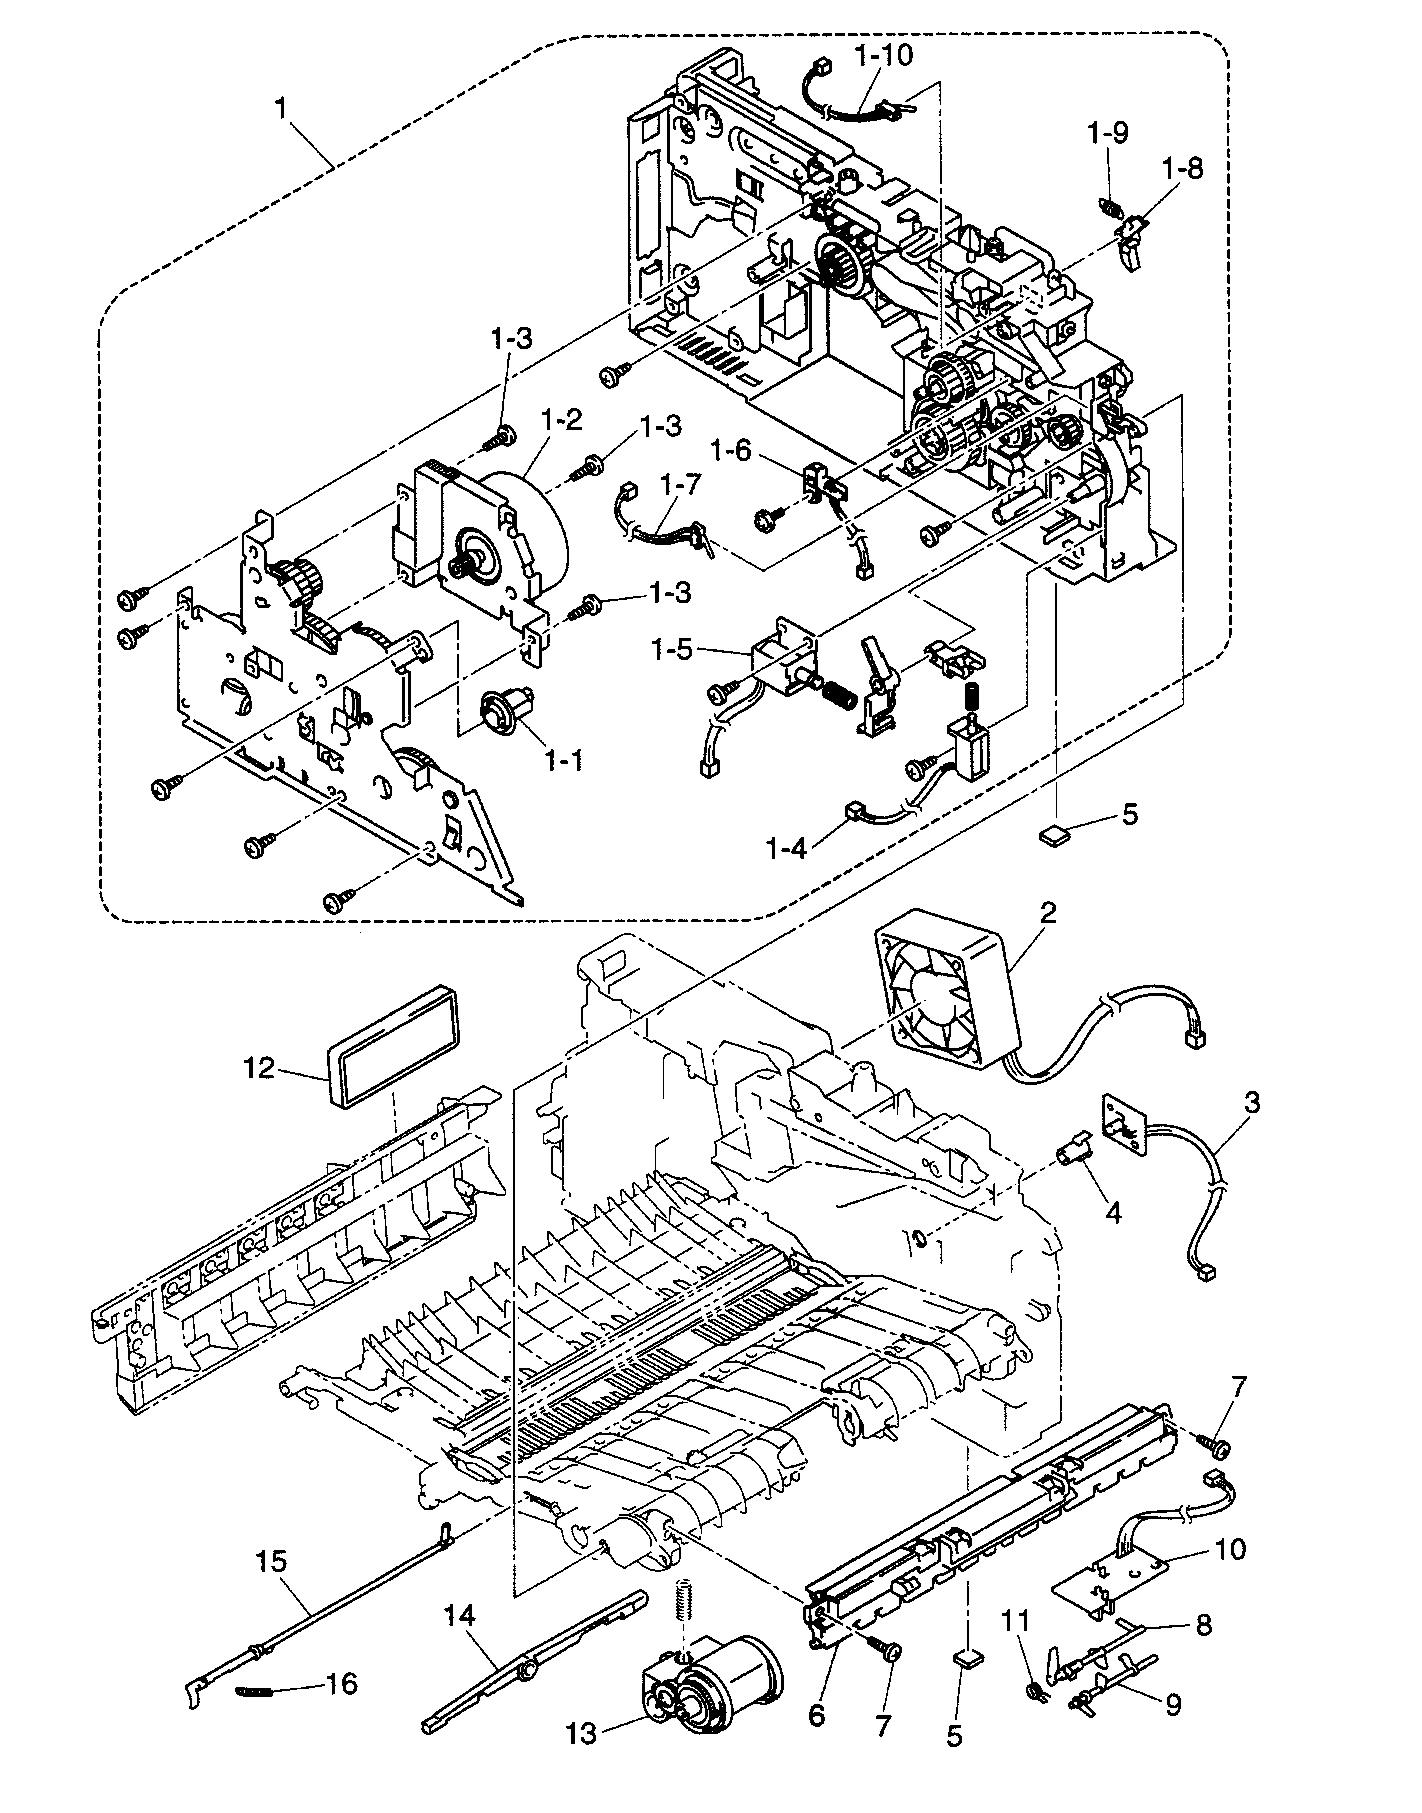 rj21 connector wiring diagram